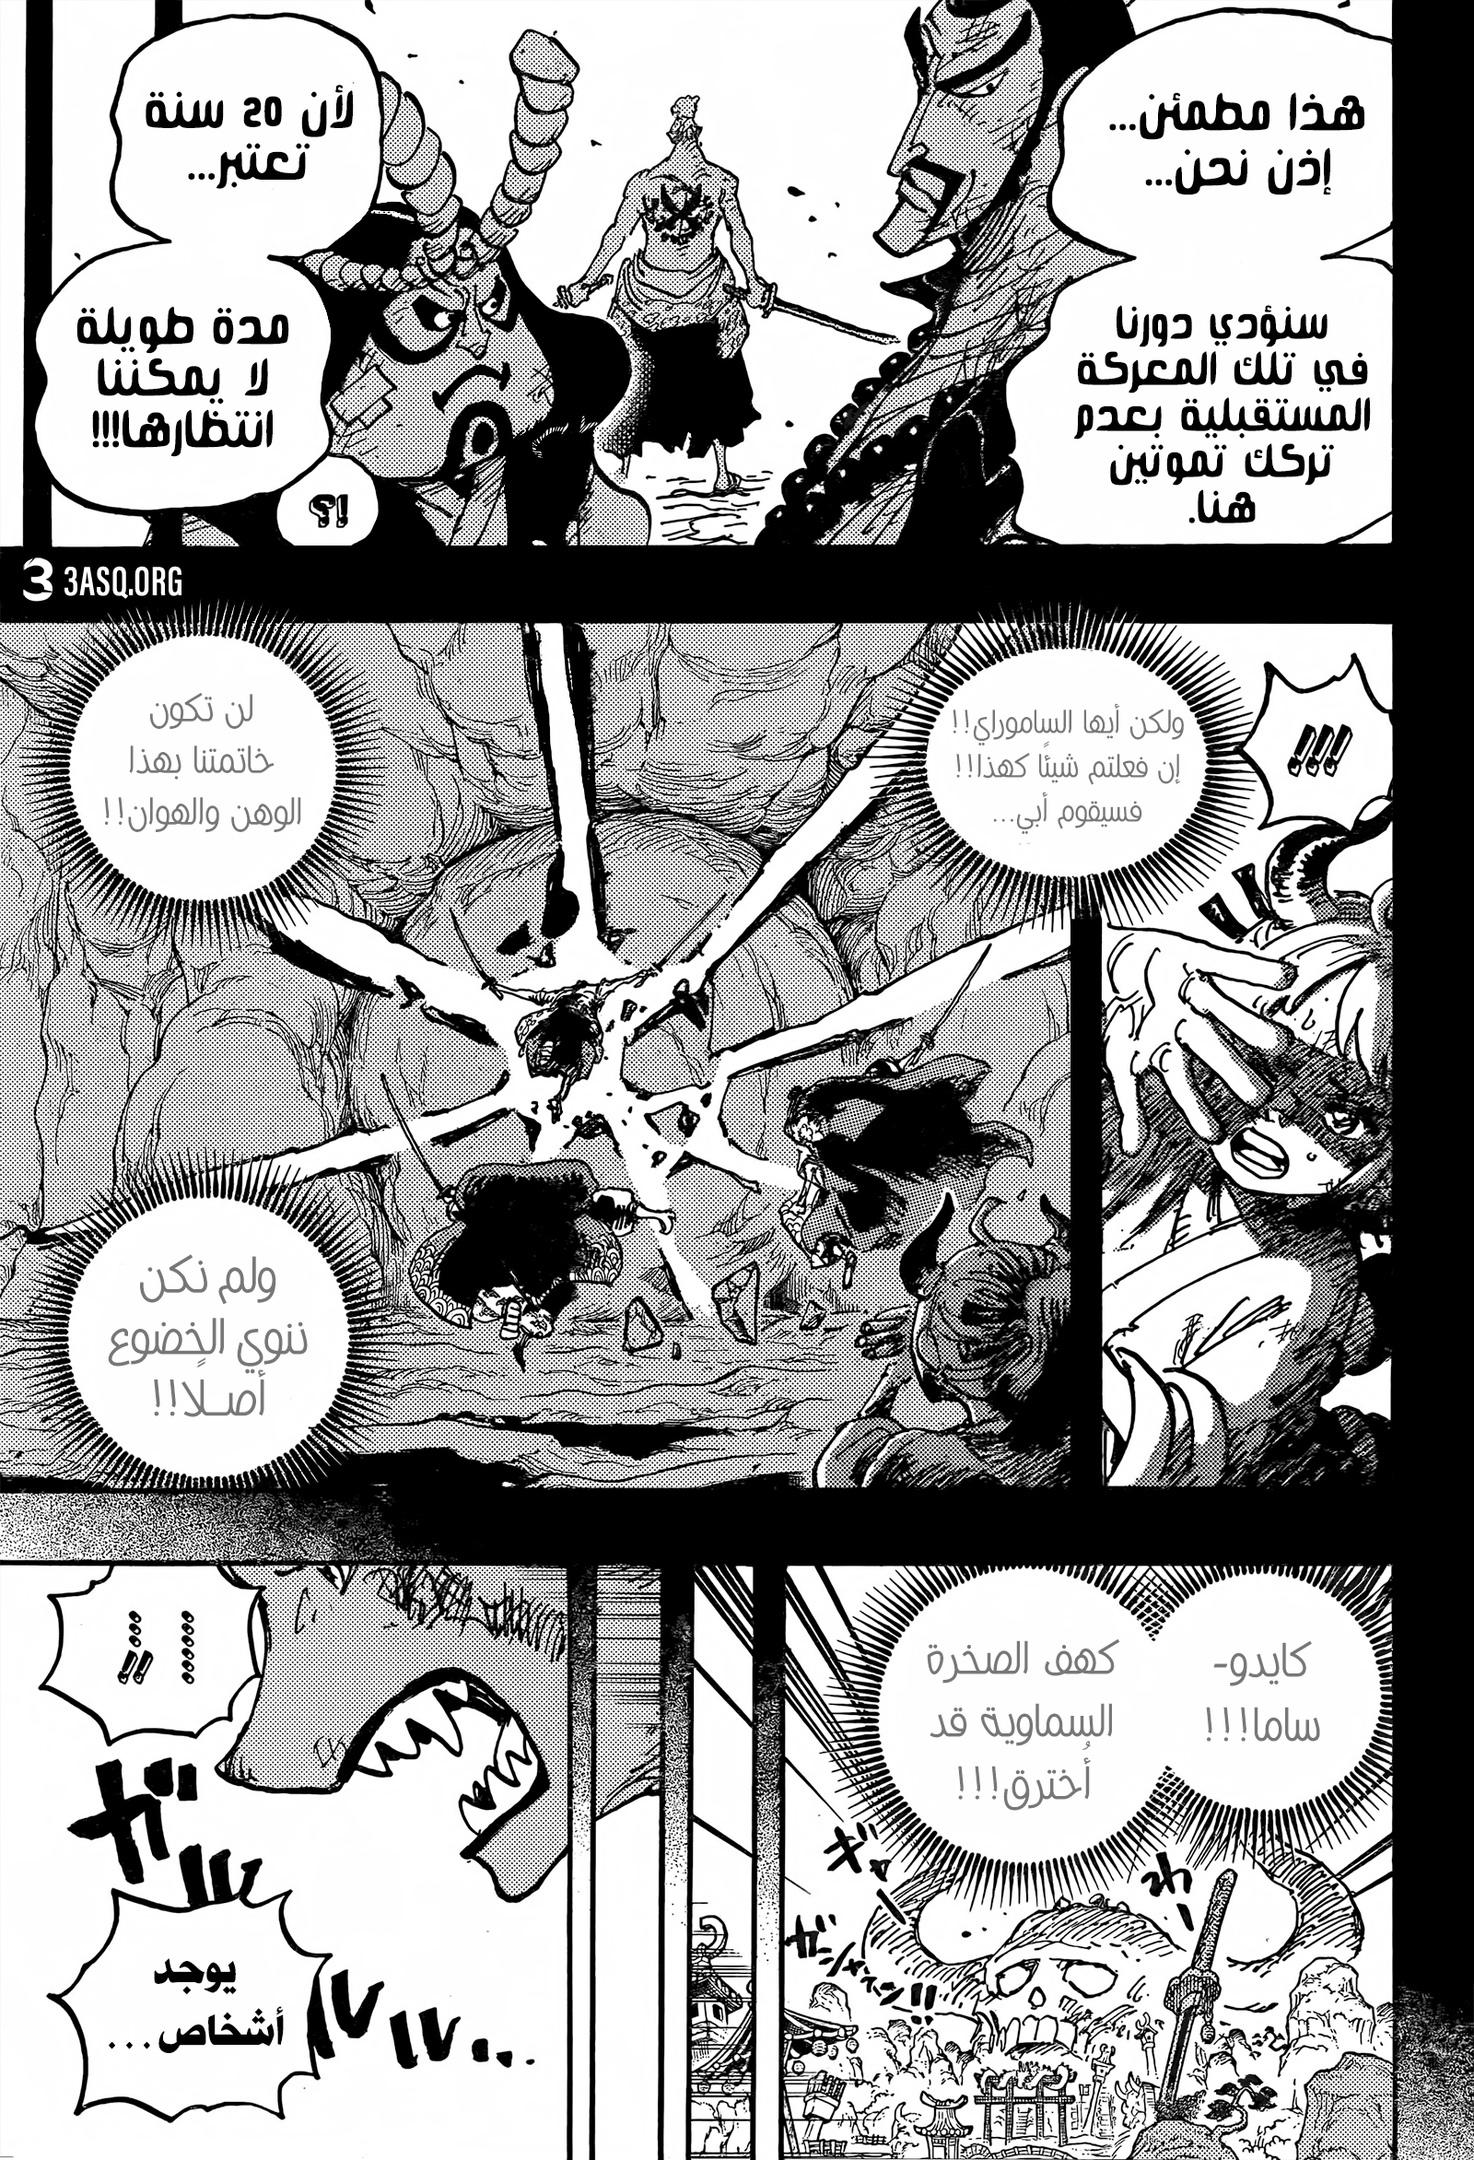 One Piece Arab 1024, image №17